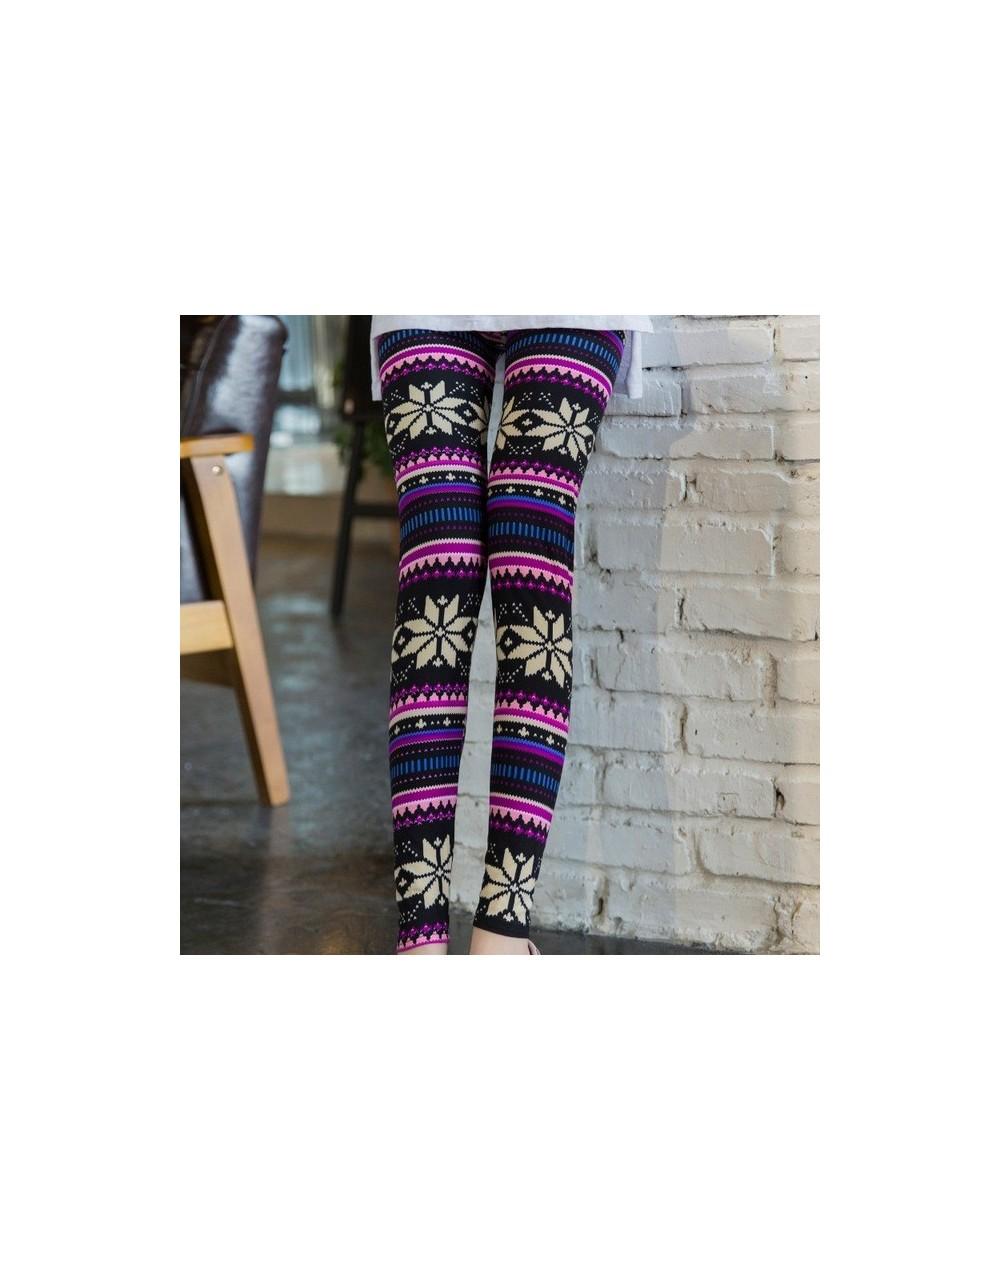 New 2019 Starry sky Flower Printed Legging Fashion Slim Women leggings Thin High Elastic Cotton Causal Fitness Pants - 7 - 4...